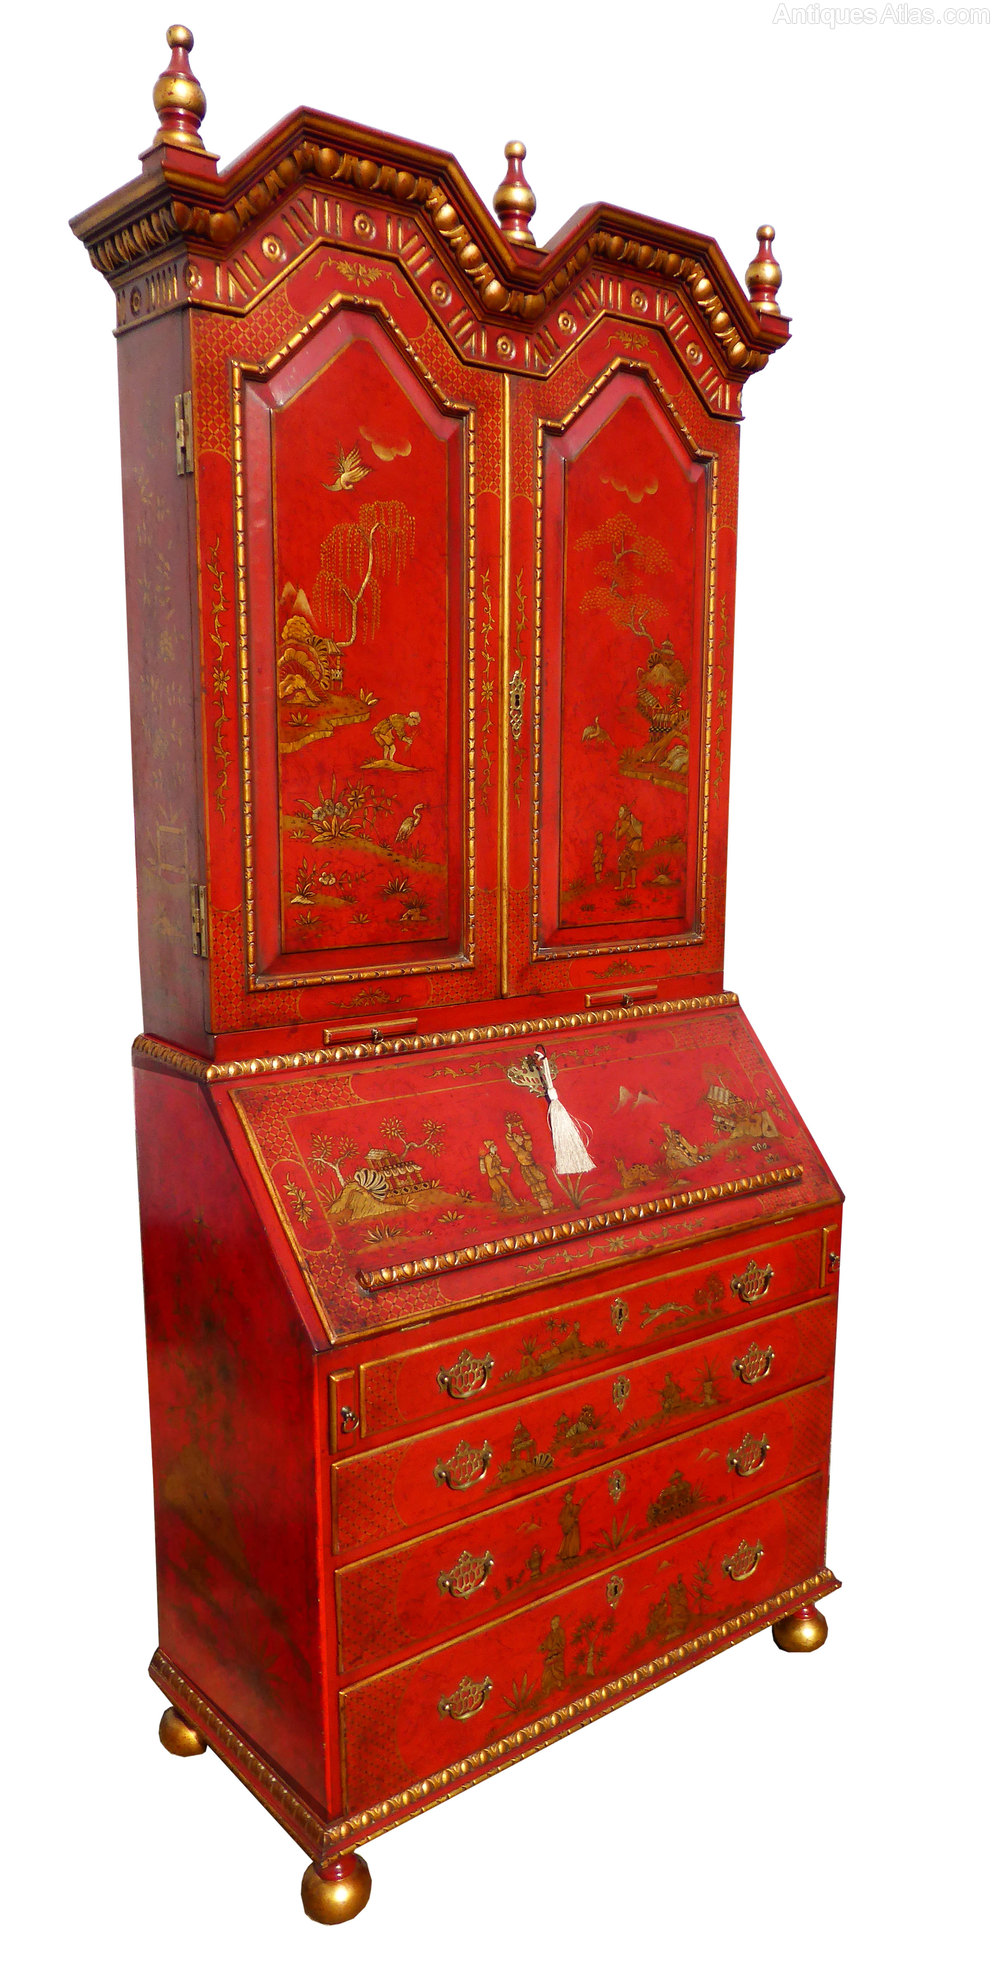 Antique Chinoiserie Bureau Bookcase ... - Antique Chinoiserie Bureau Bookcase - Antiques Atlas